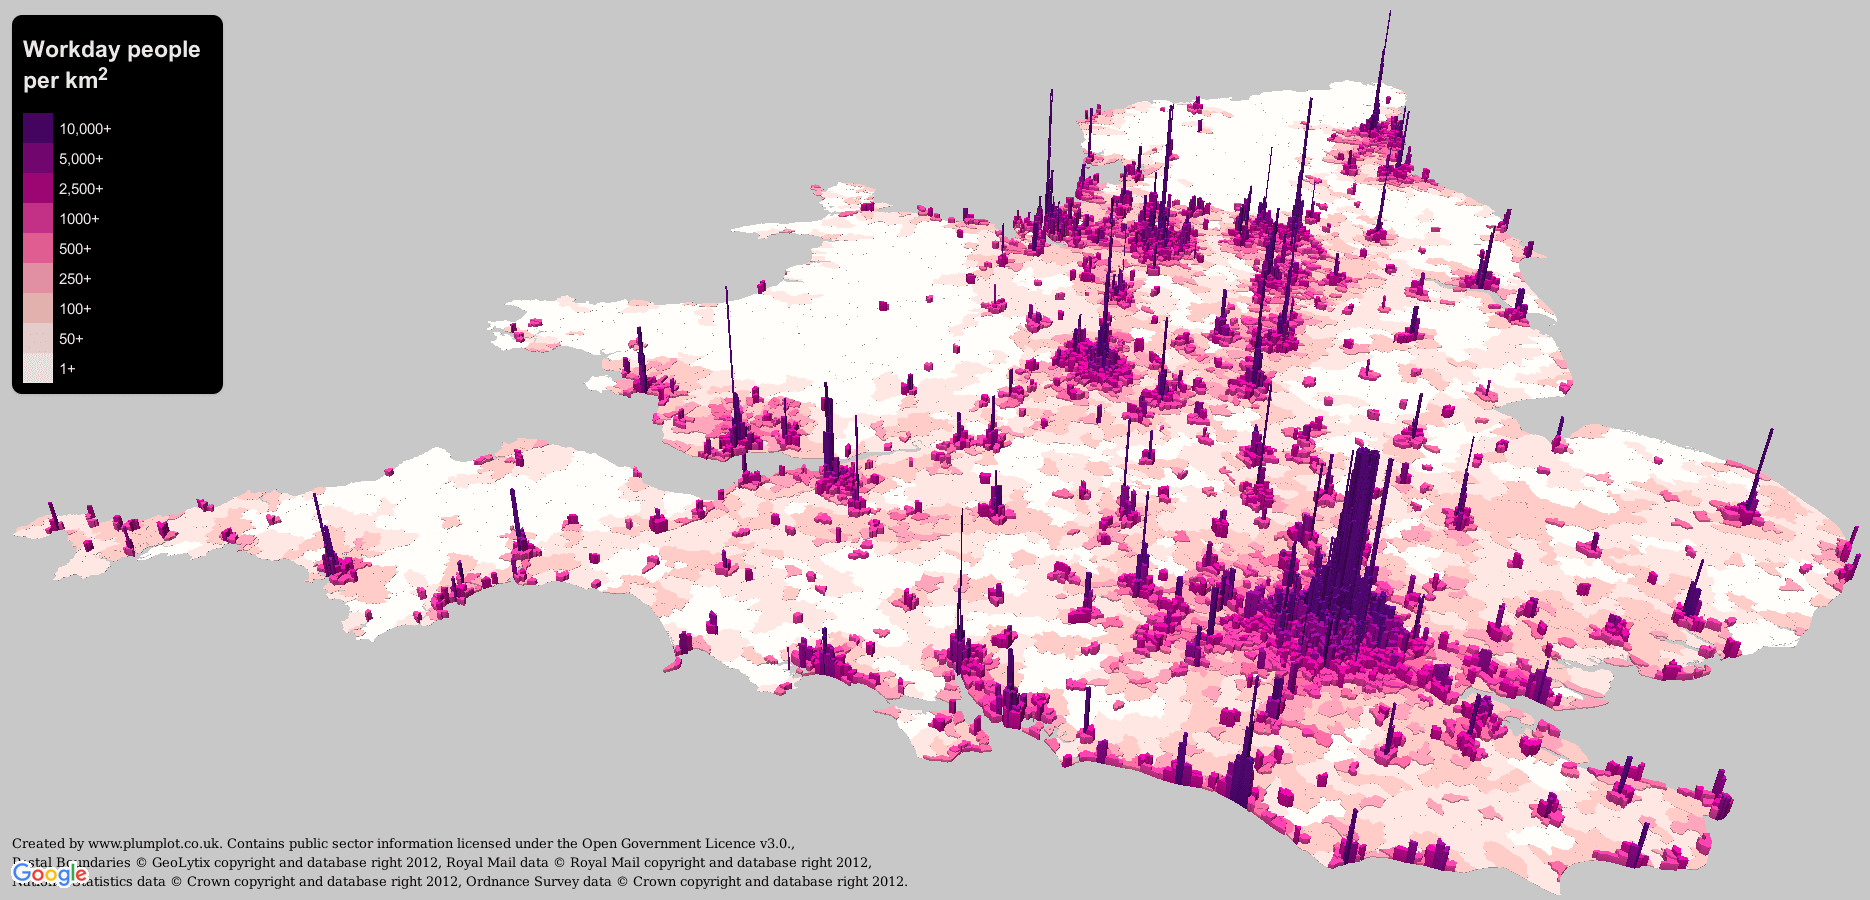 Workday people, per square kilometer